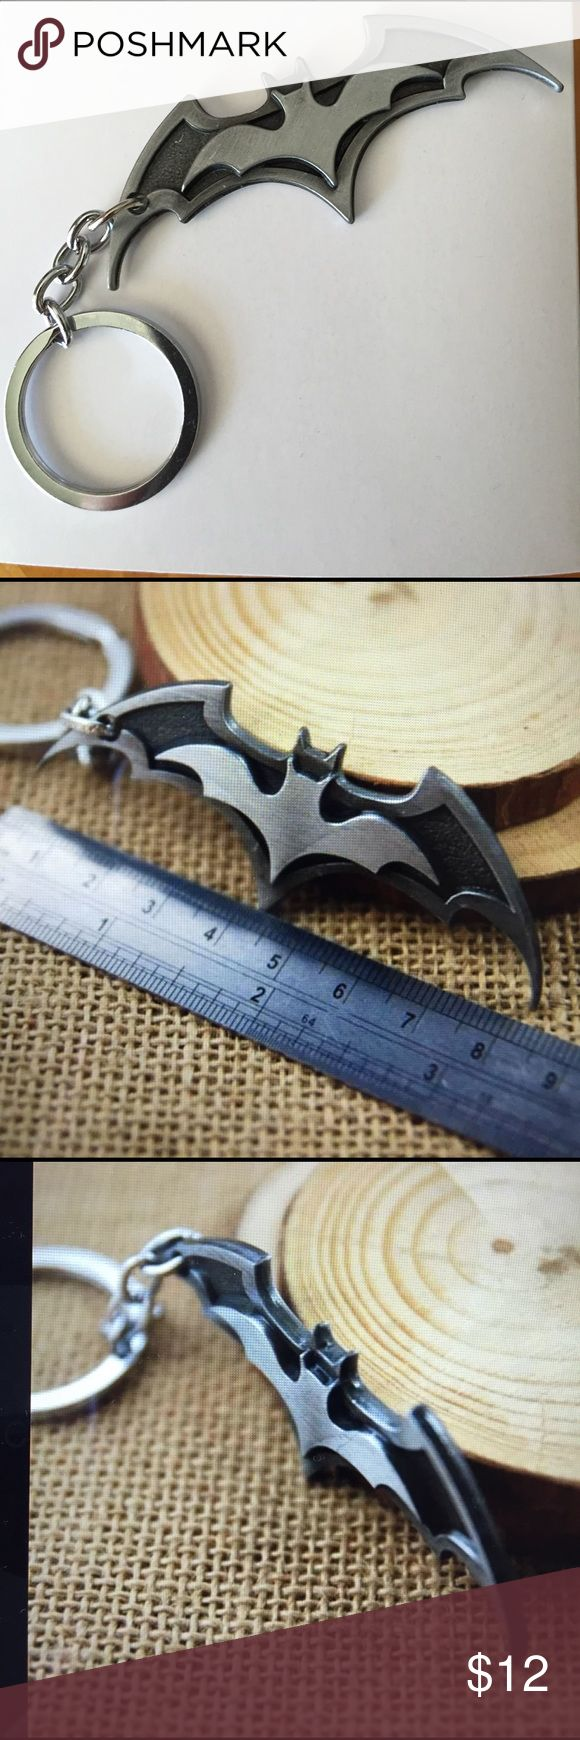 Flaming art tattoo for geek tattoo lovers this kind of batman - Batman Alloy Metal Key Ring New Boutique